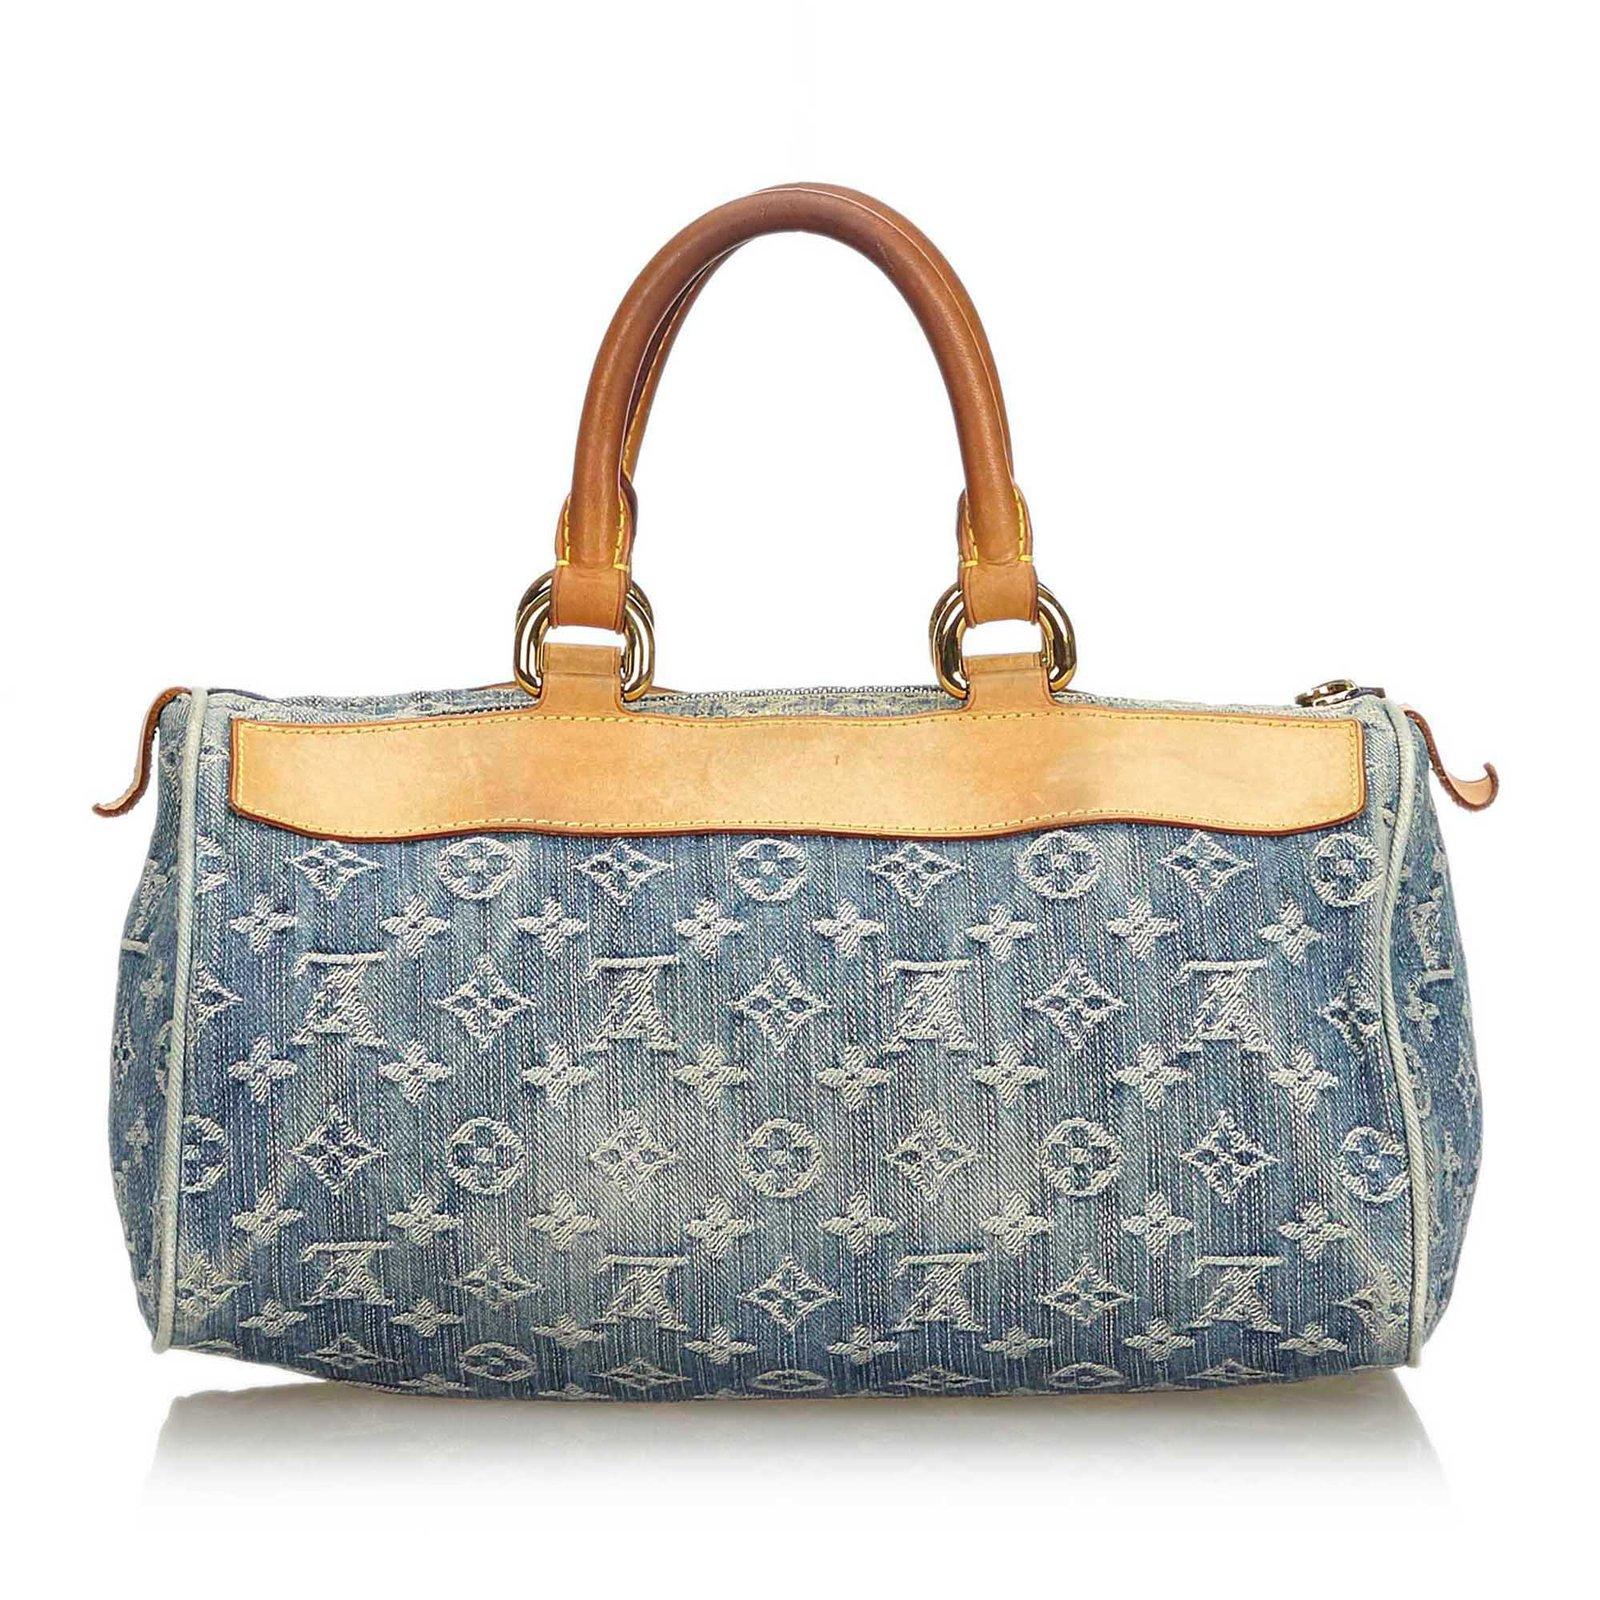 549f8fba4dca Louis Vuitton Monogram Denim Neo Speedy Handbags Leather